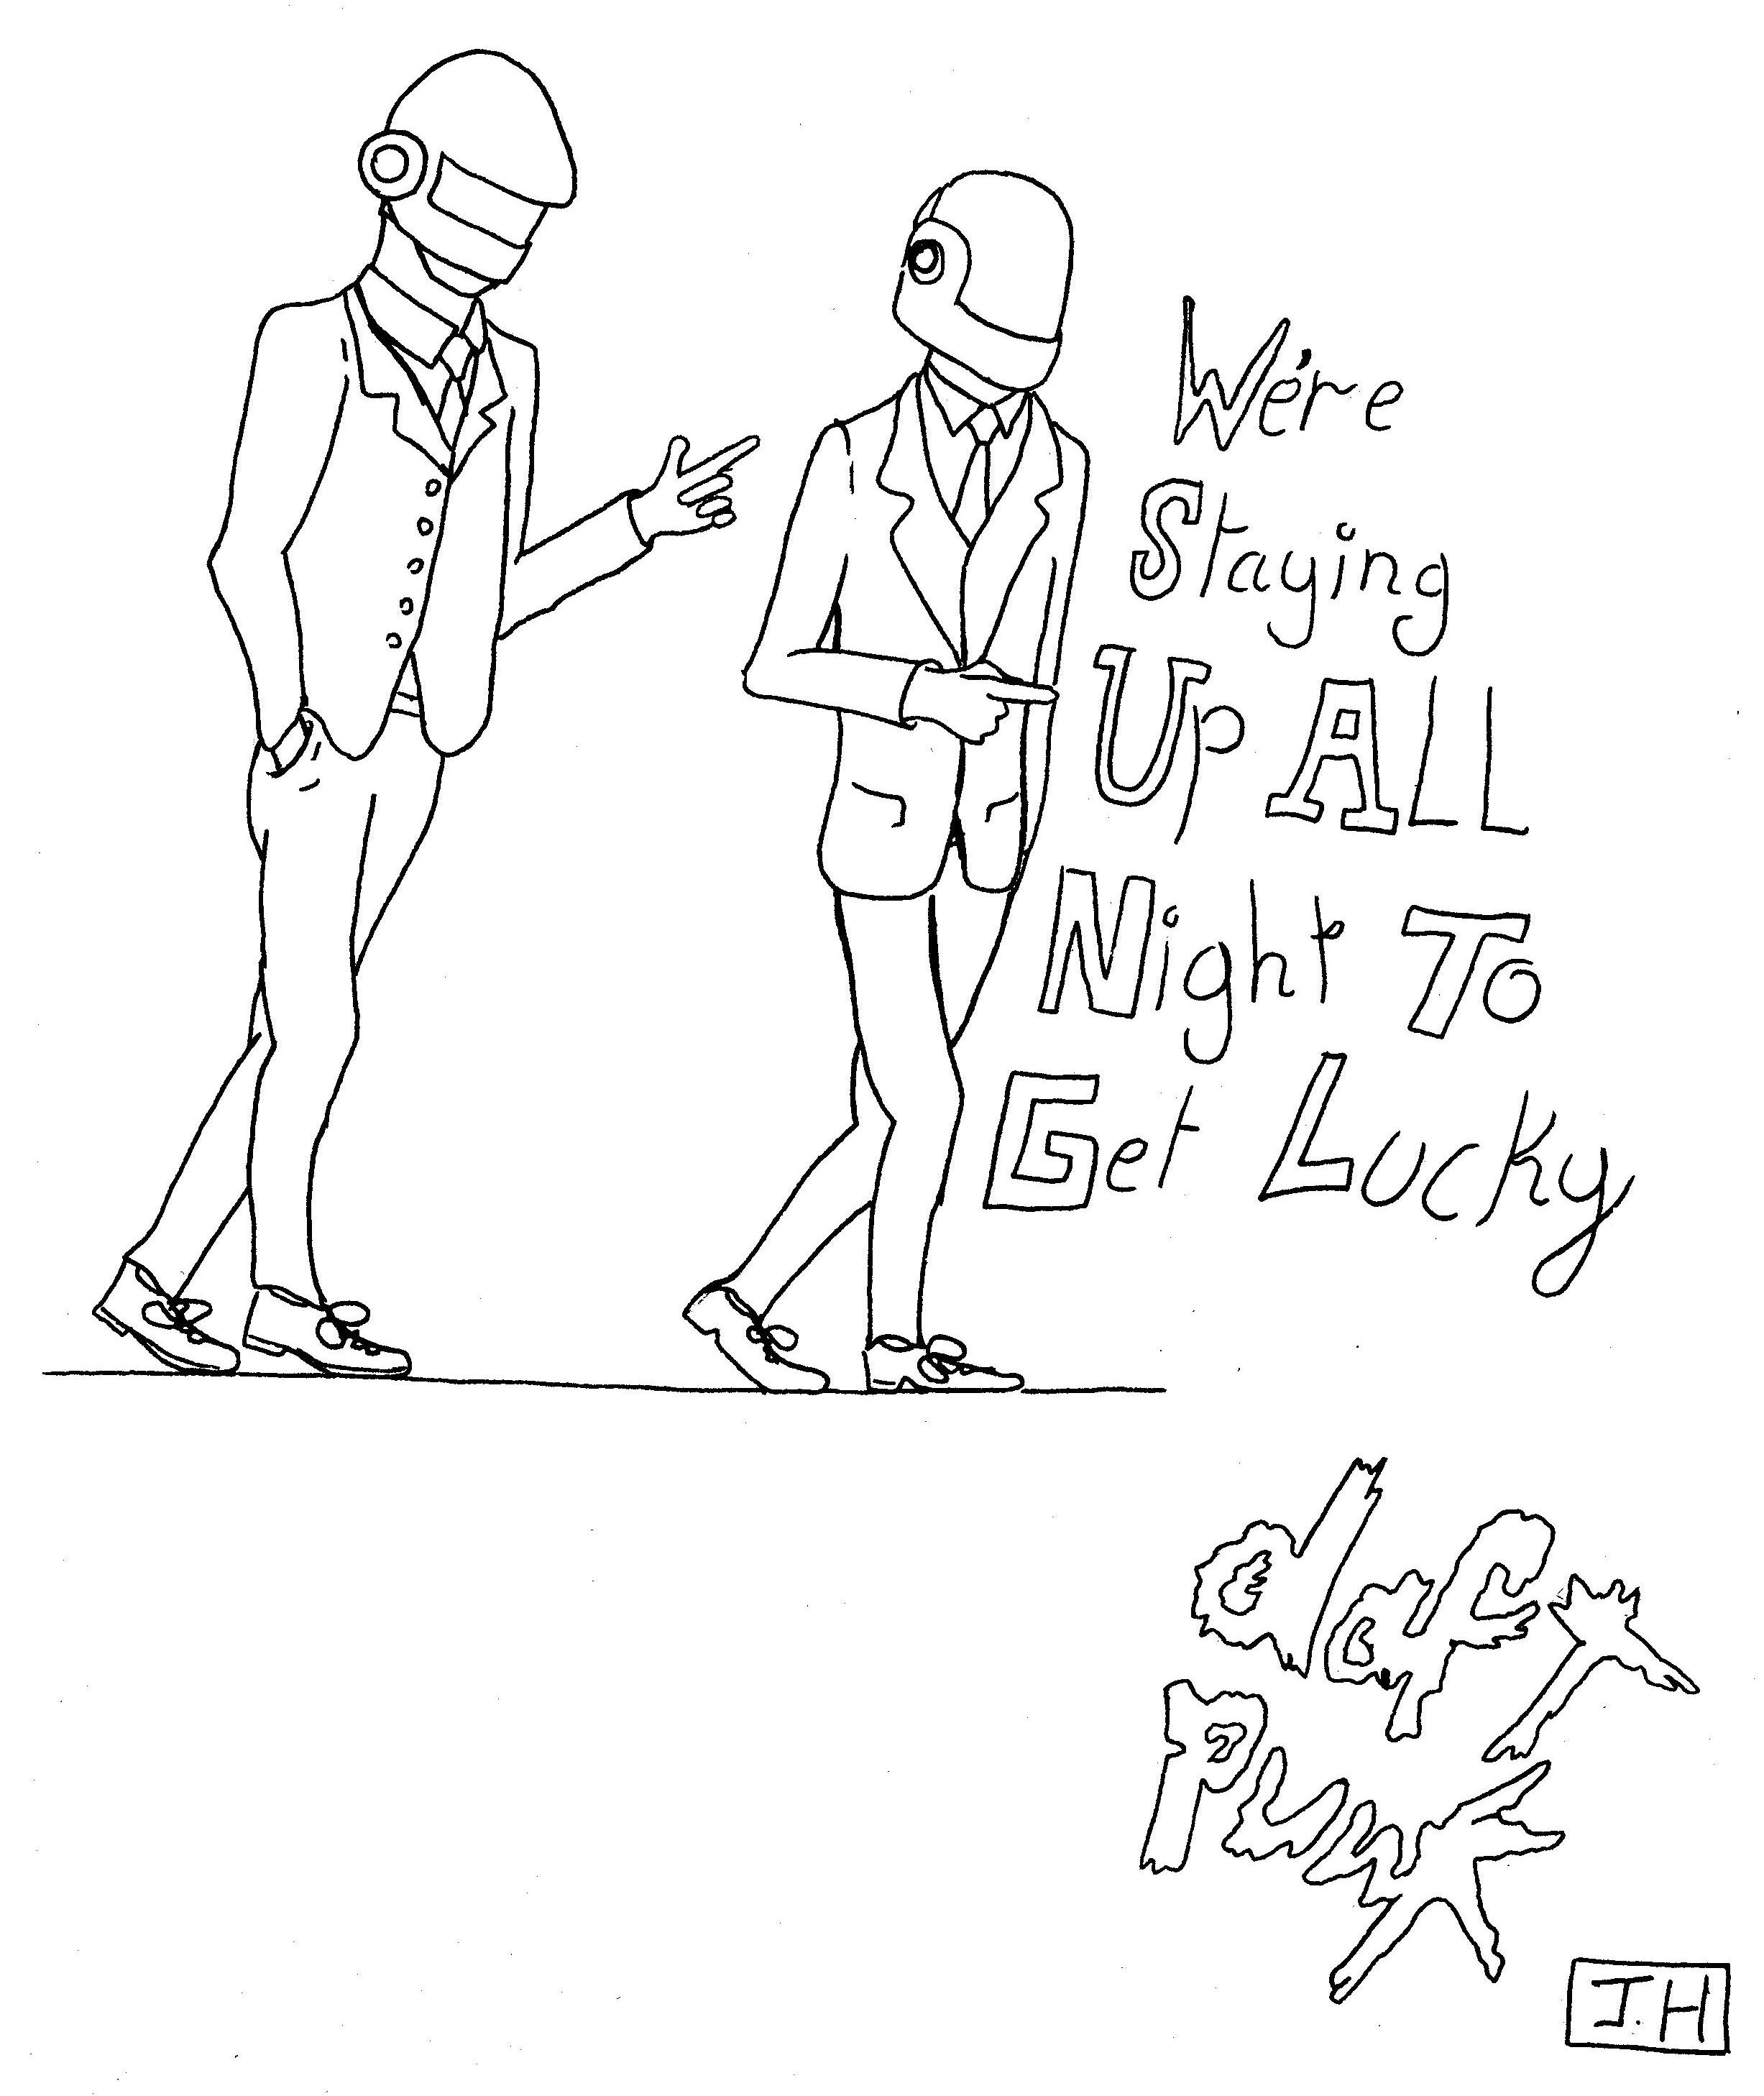 Daft punk initial sketch